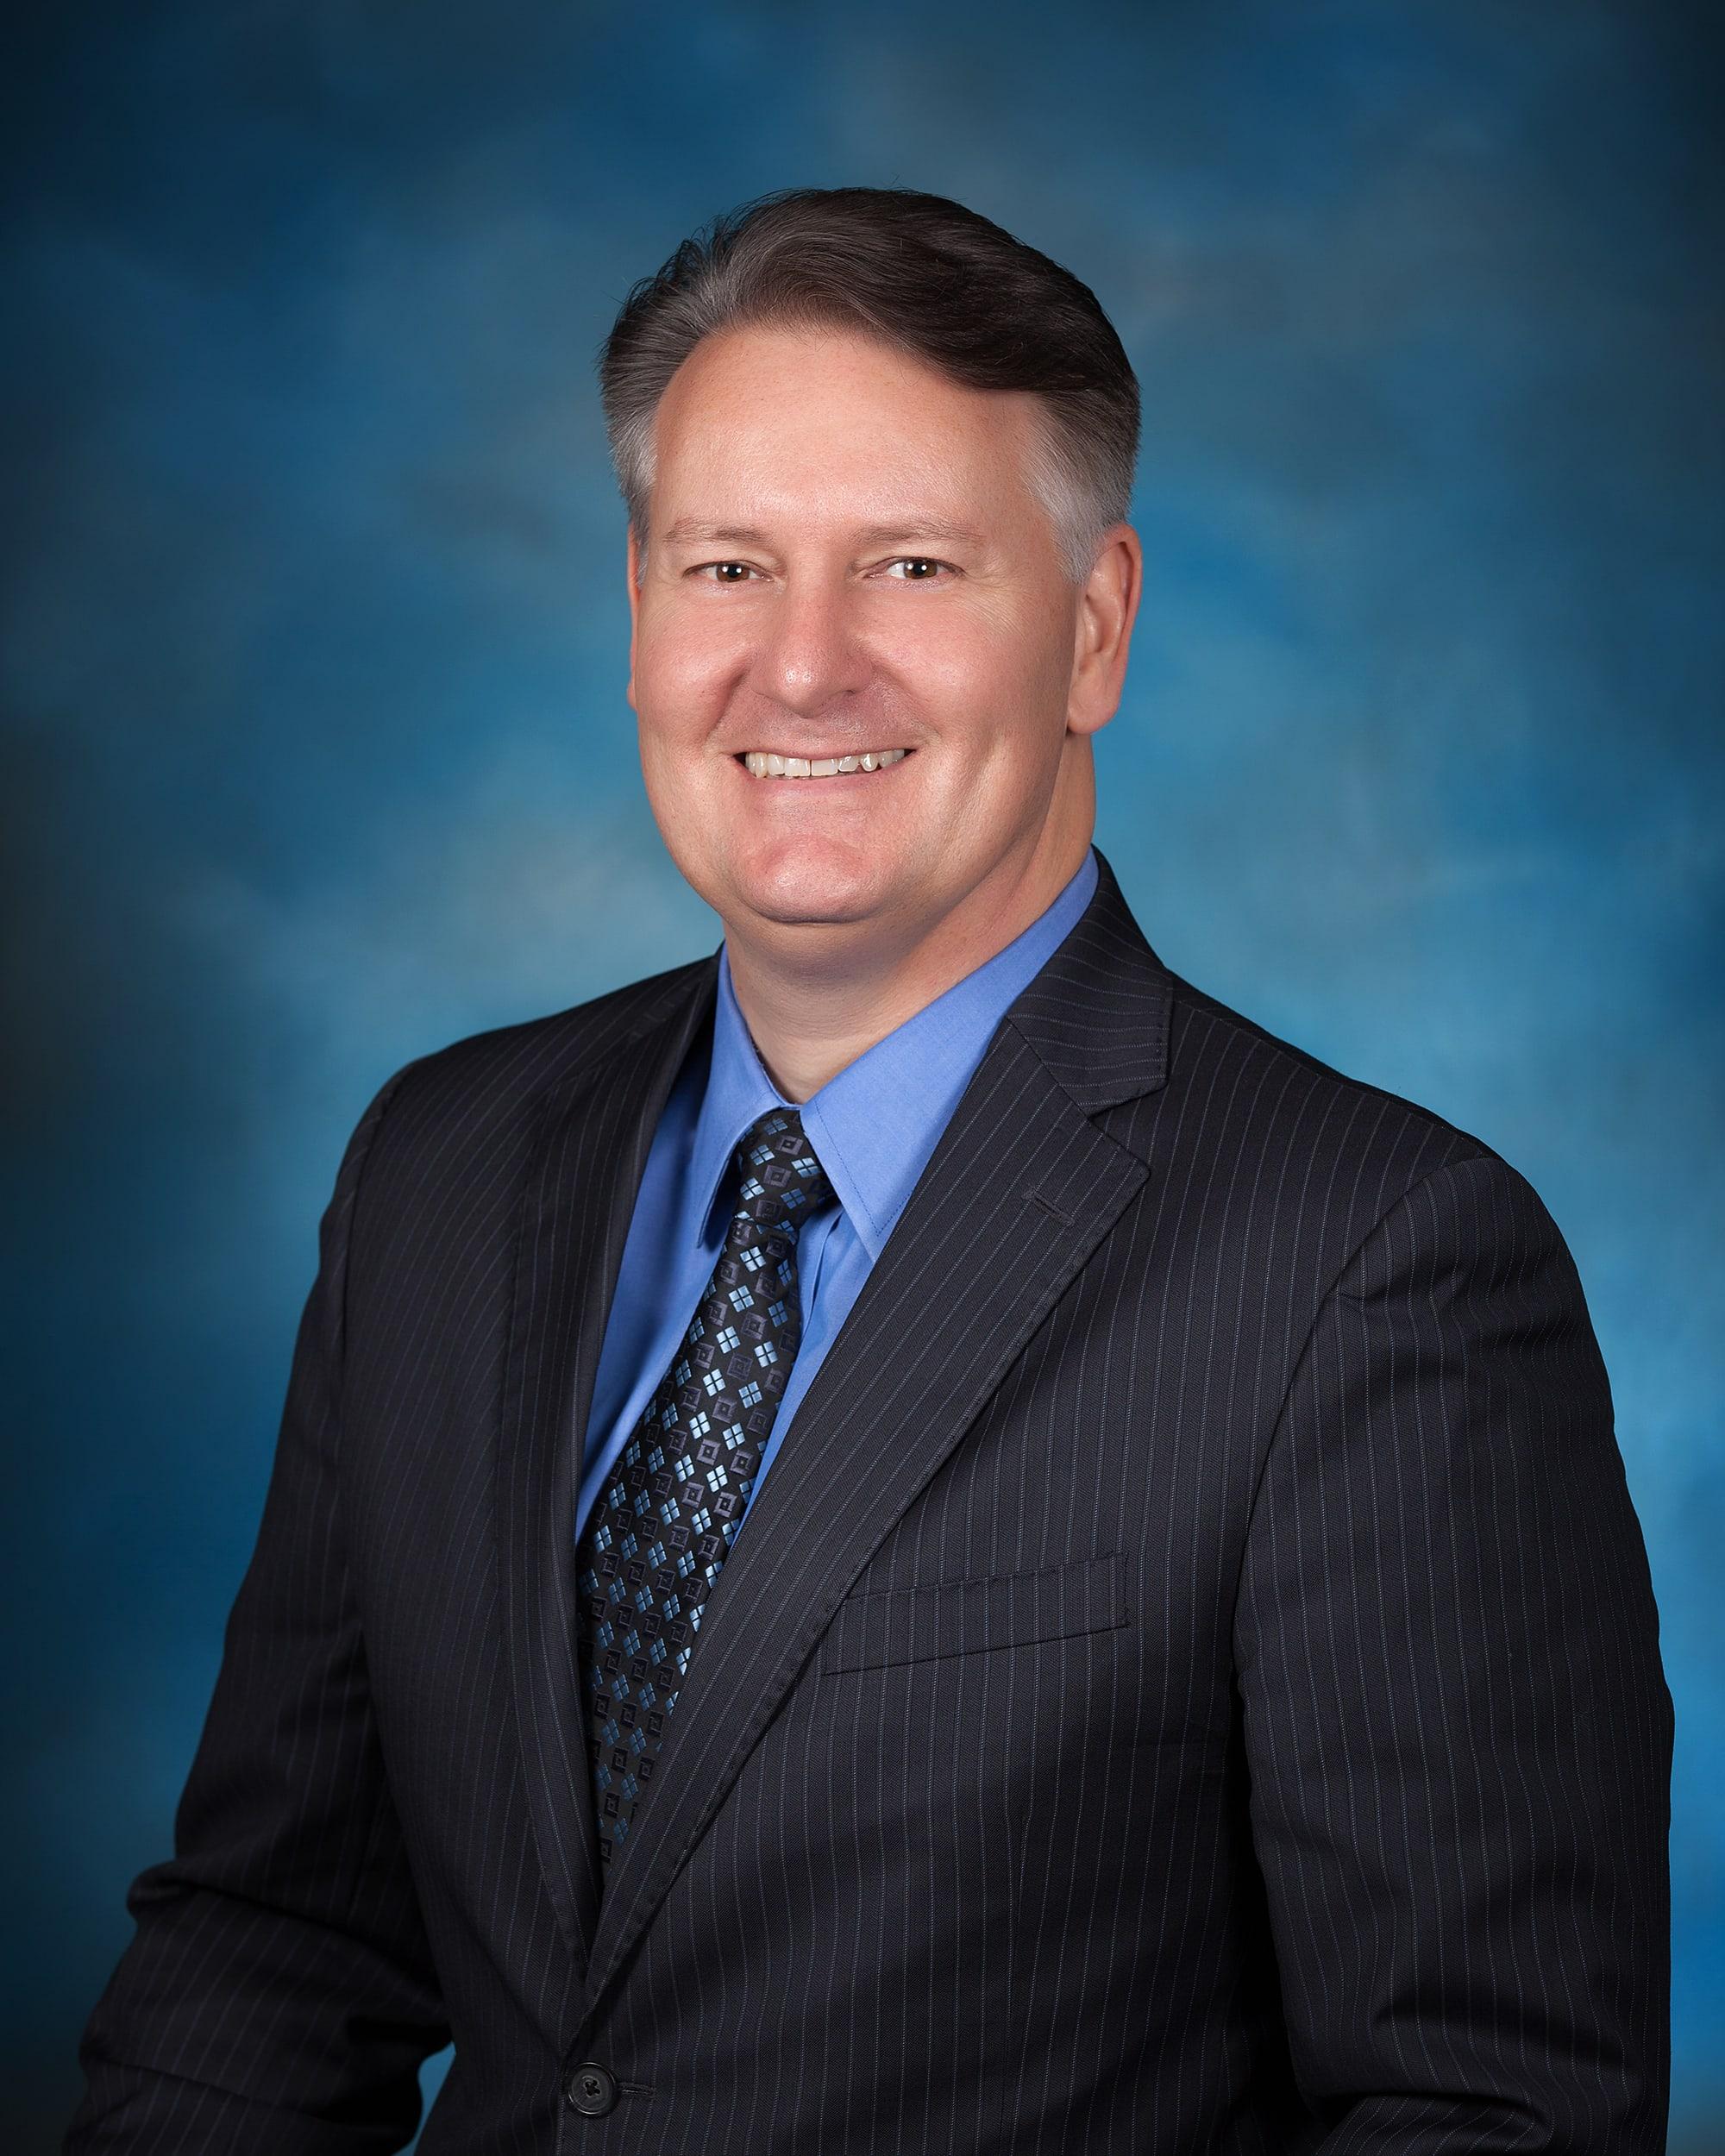 Neil Thornbury, Chief Executive Officer